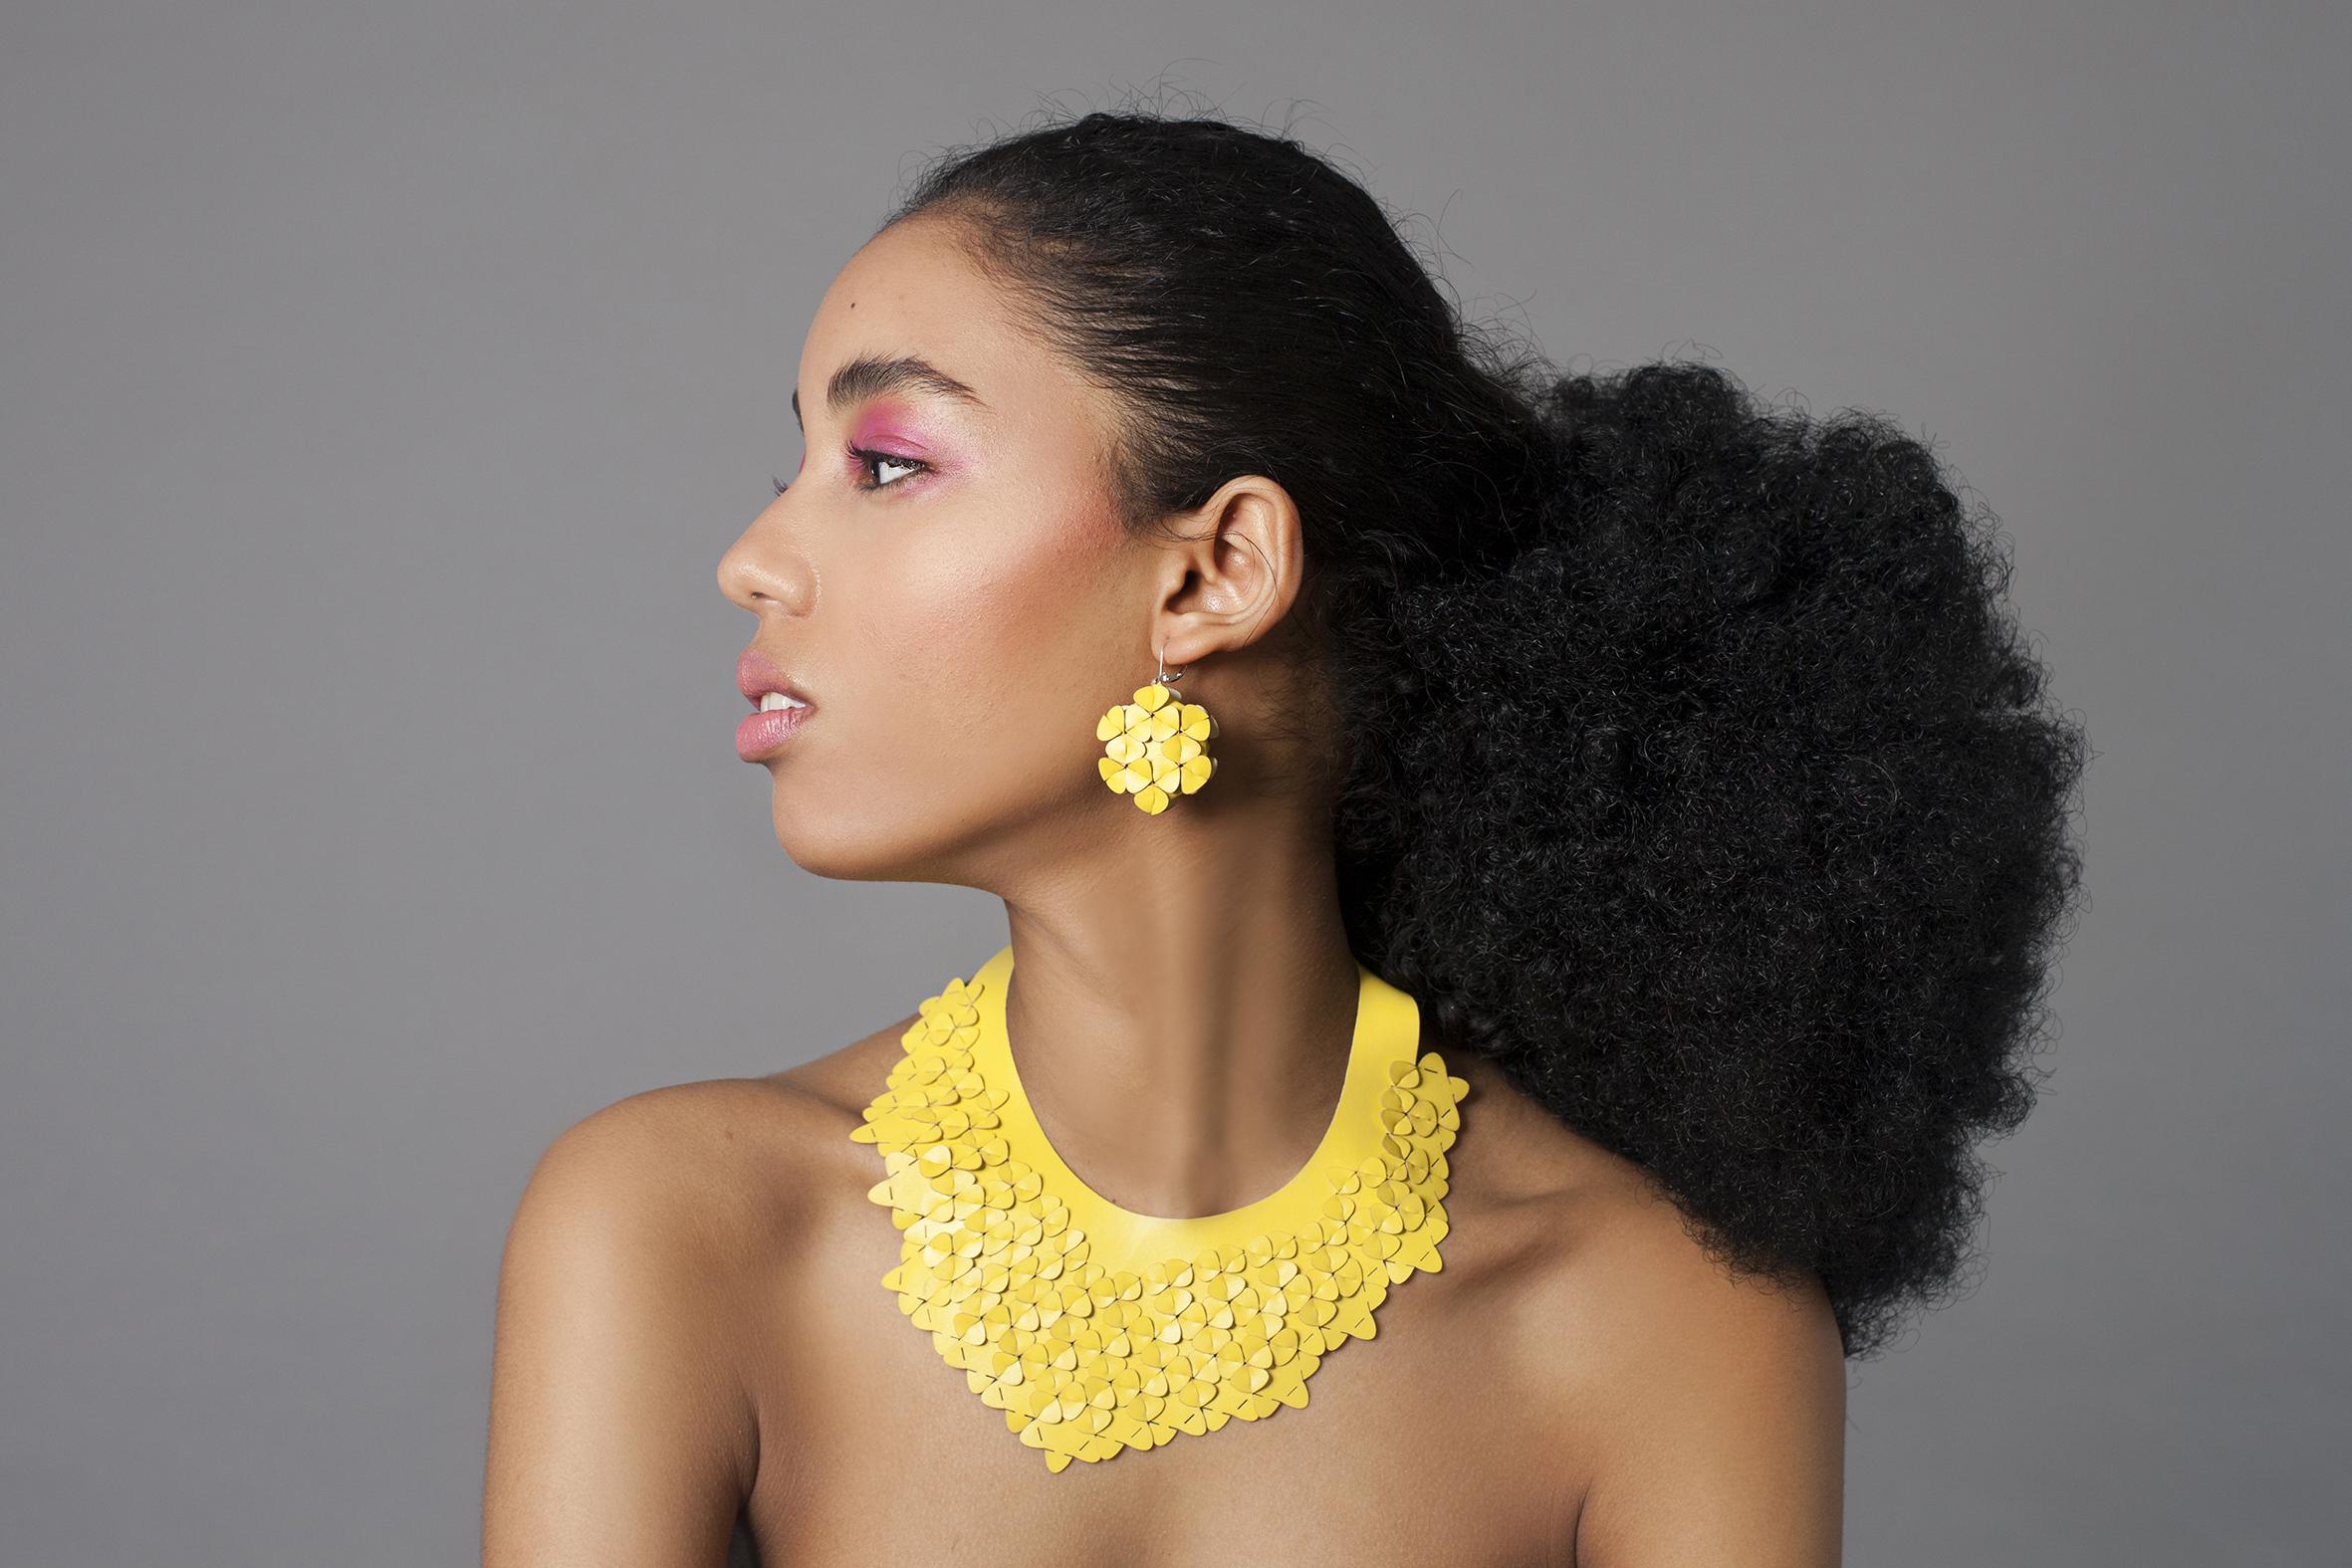 Iris Nijenhuis FAB L'Style Mara Stevelmans Dutch Fashion Jewellery Design